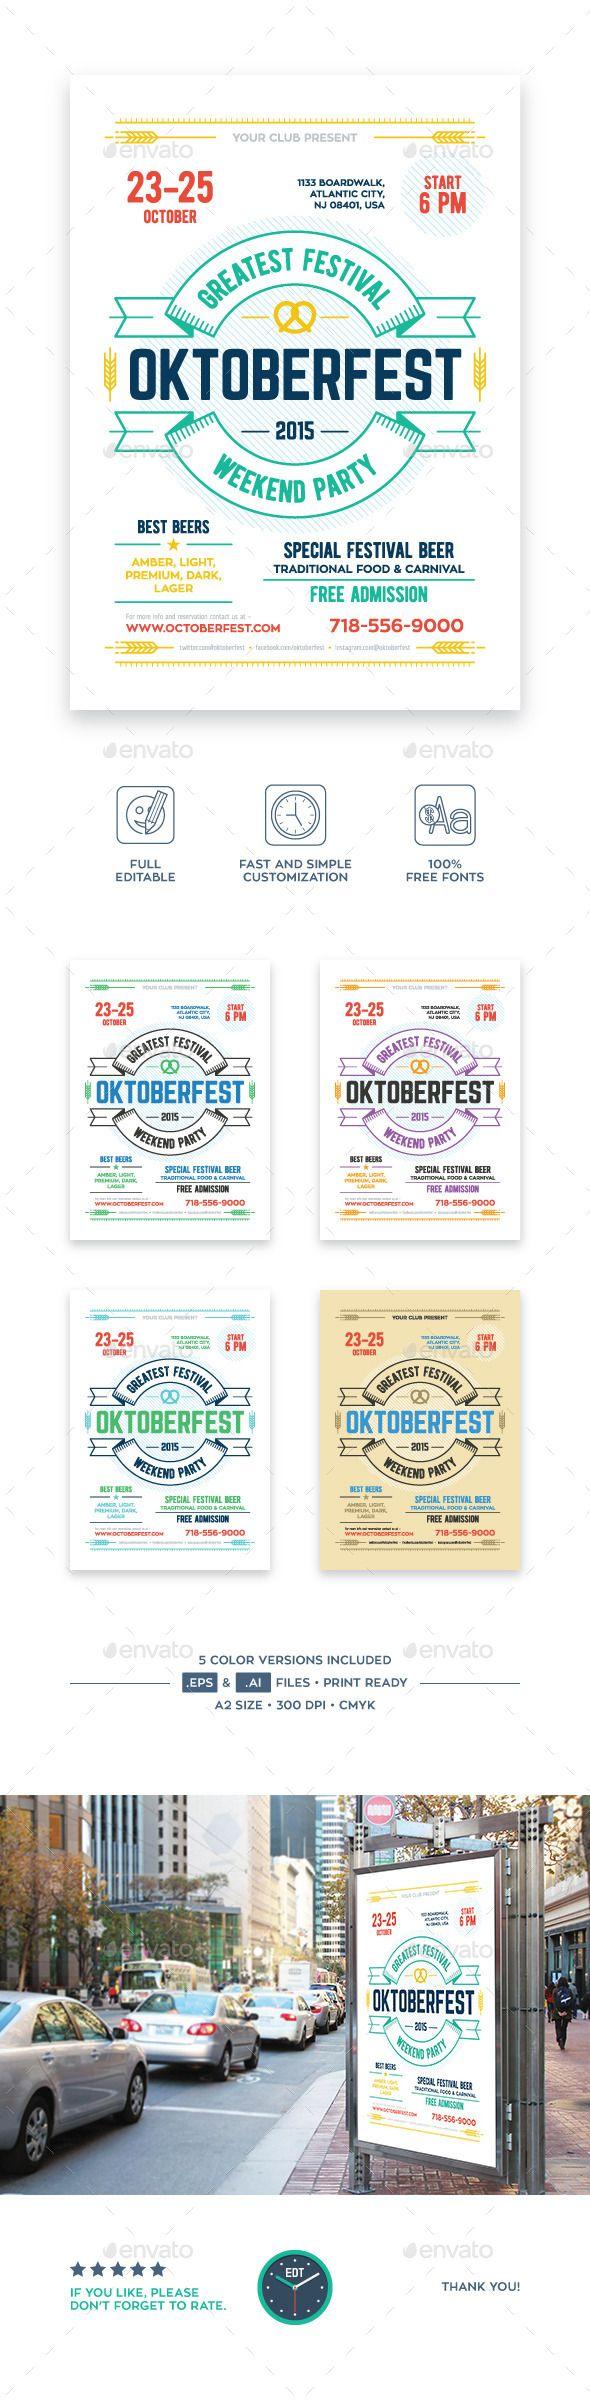 Oktoberfest Beer Festival Poster PSD Template #design Download: http://graphicriver.net/item/oktoberfest-beer-festival-poster/12712778?ref=ksioks